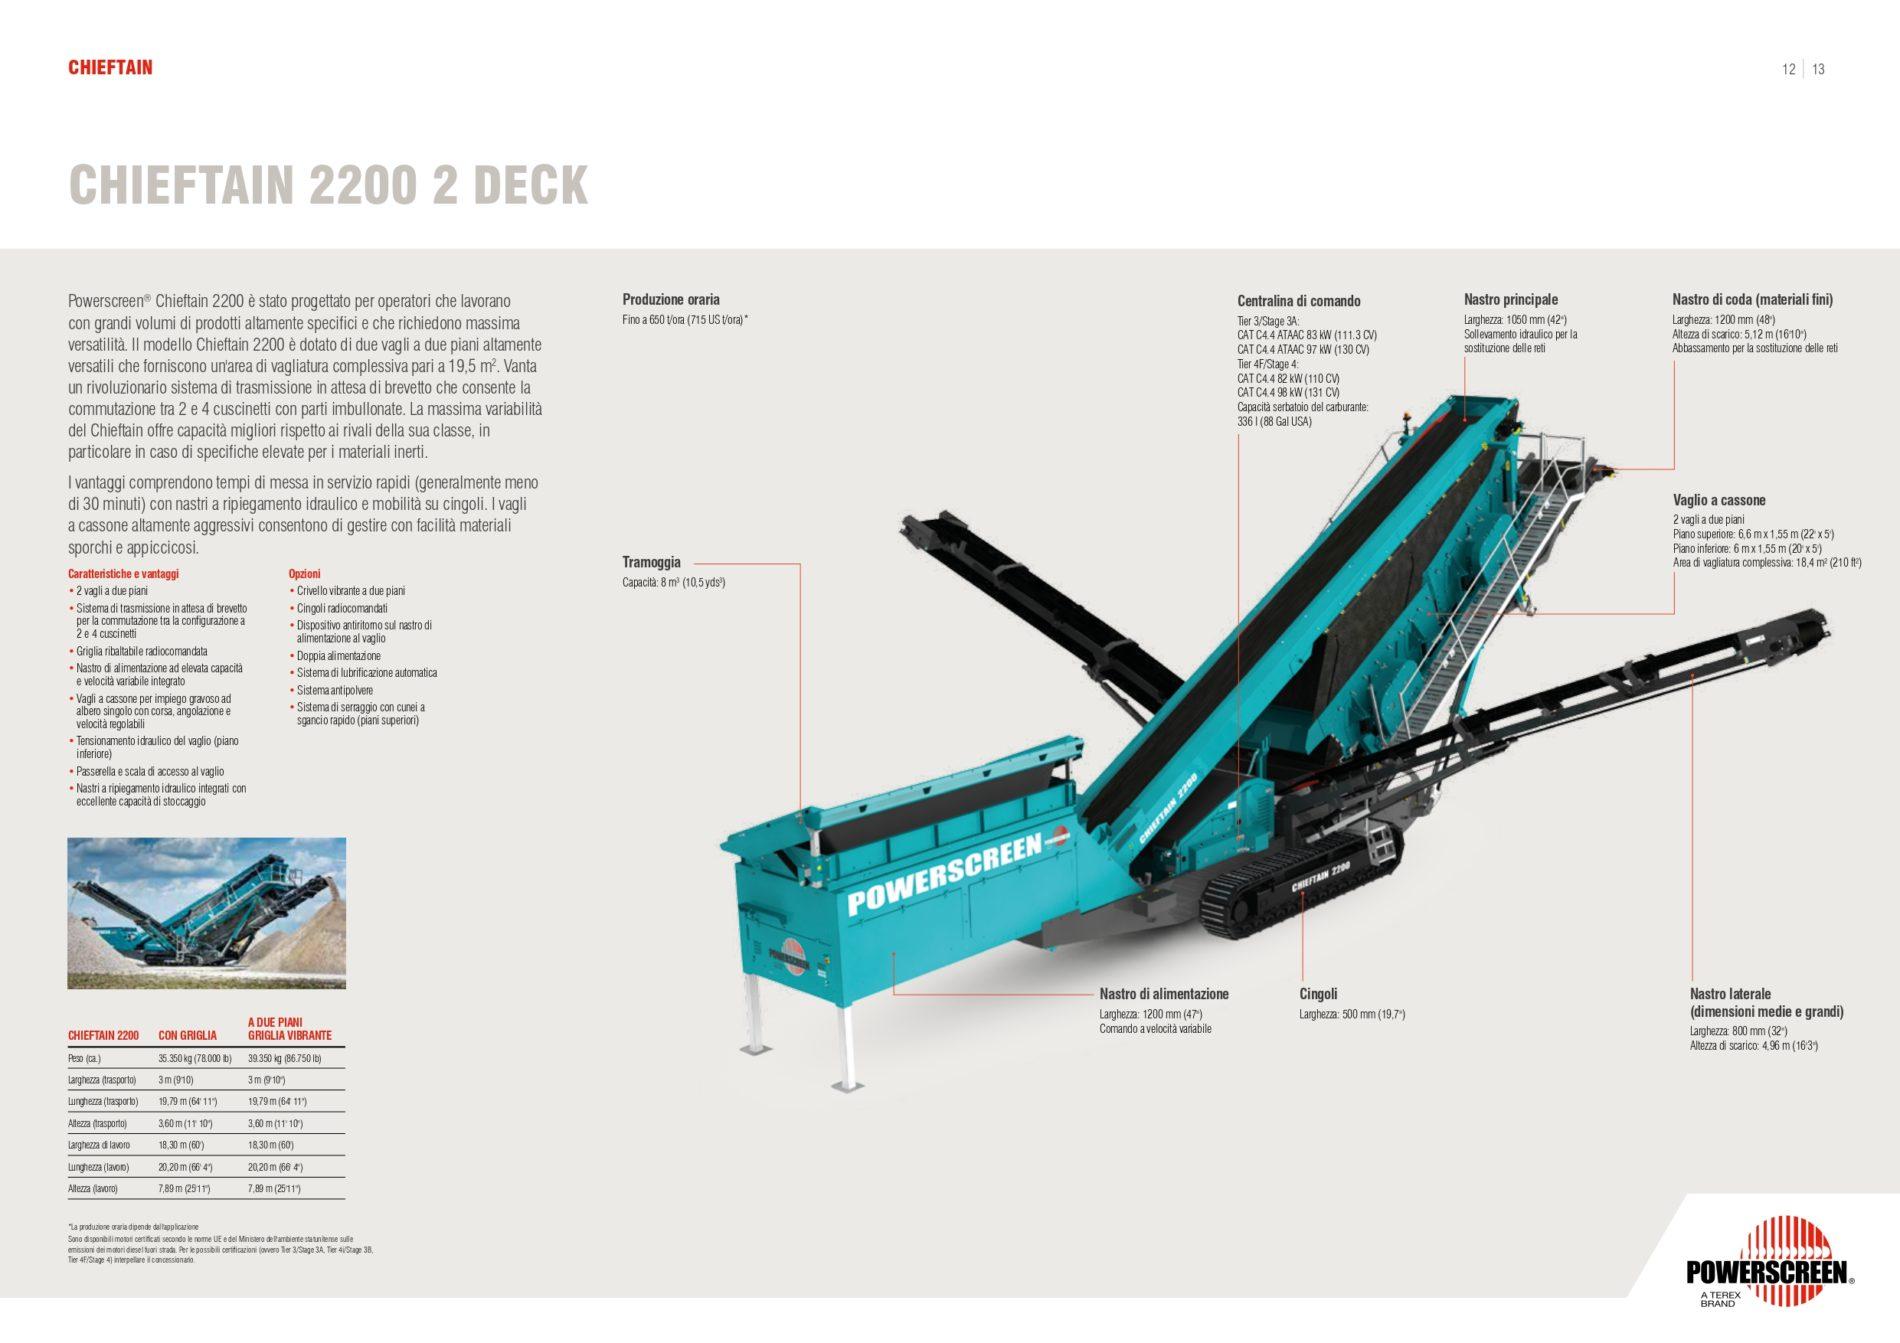 Chieftain 2200 2 Deck